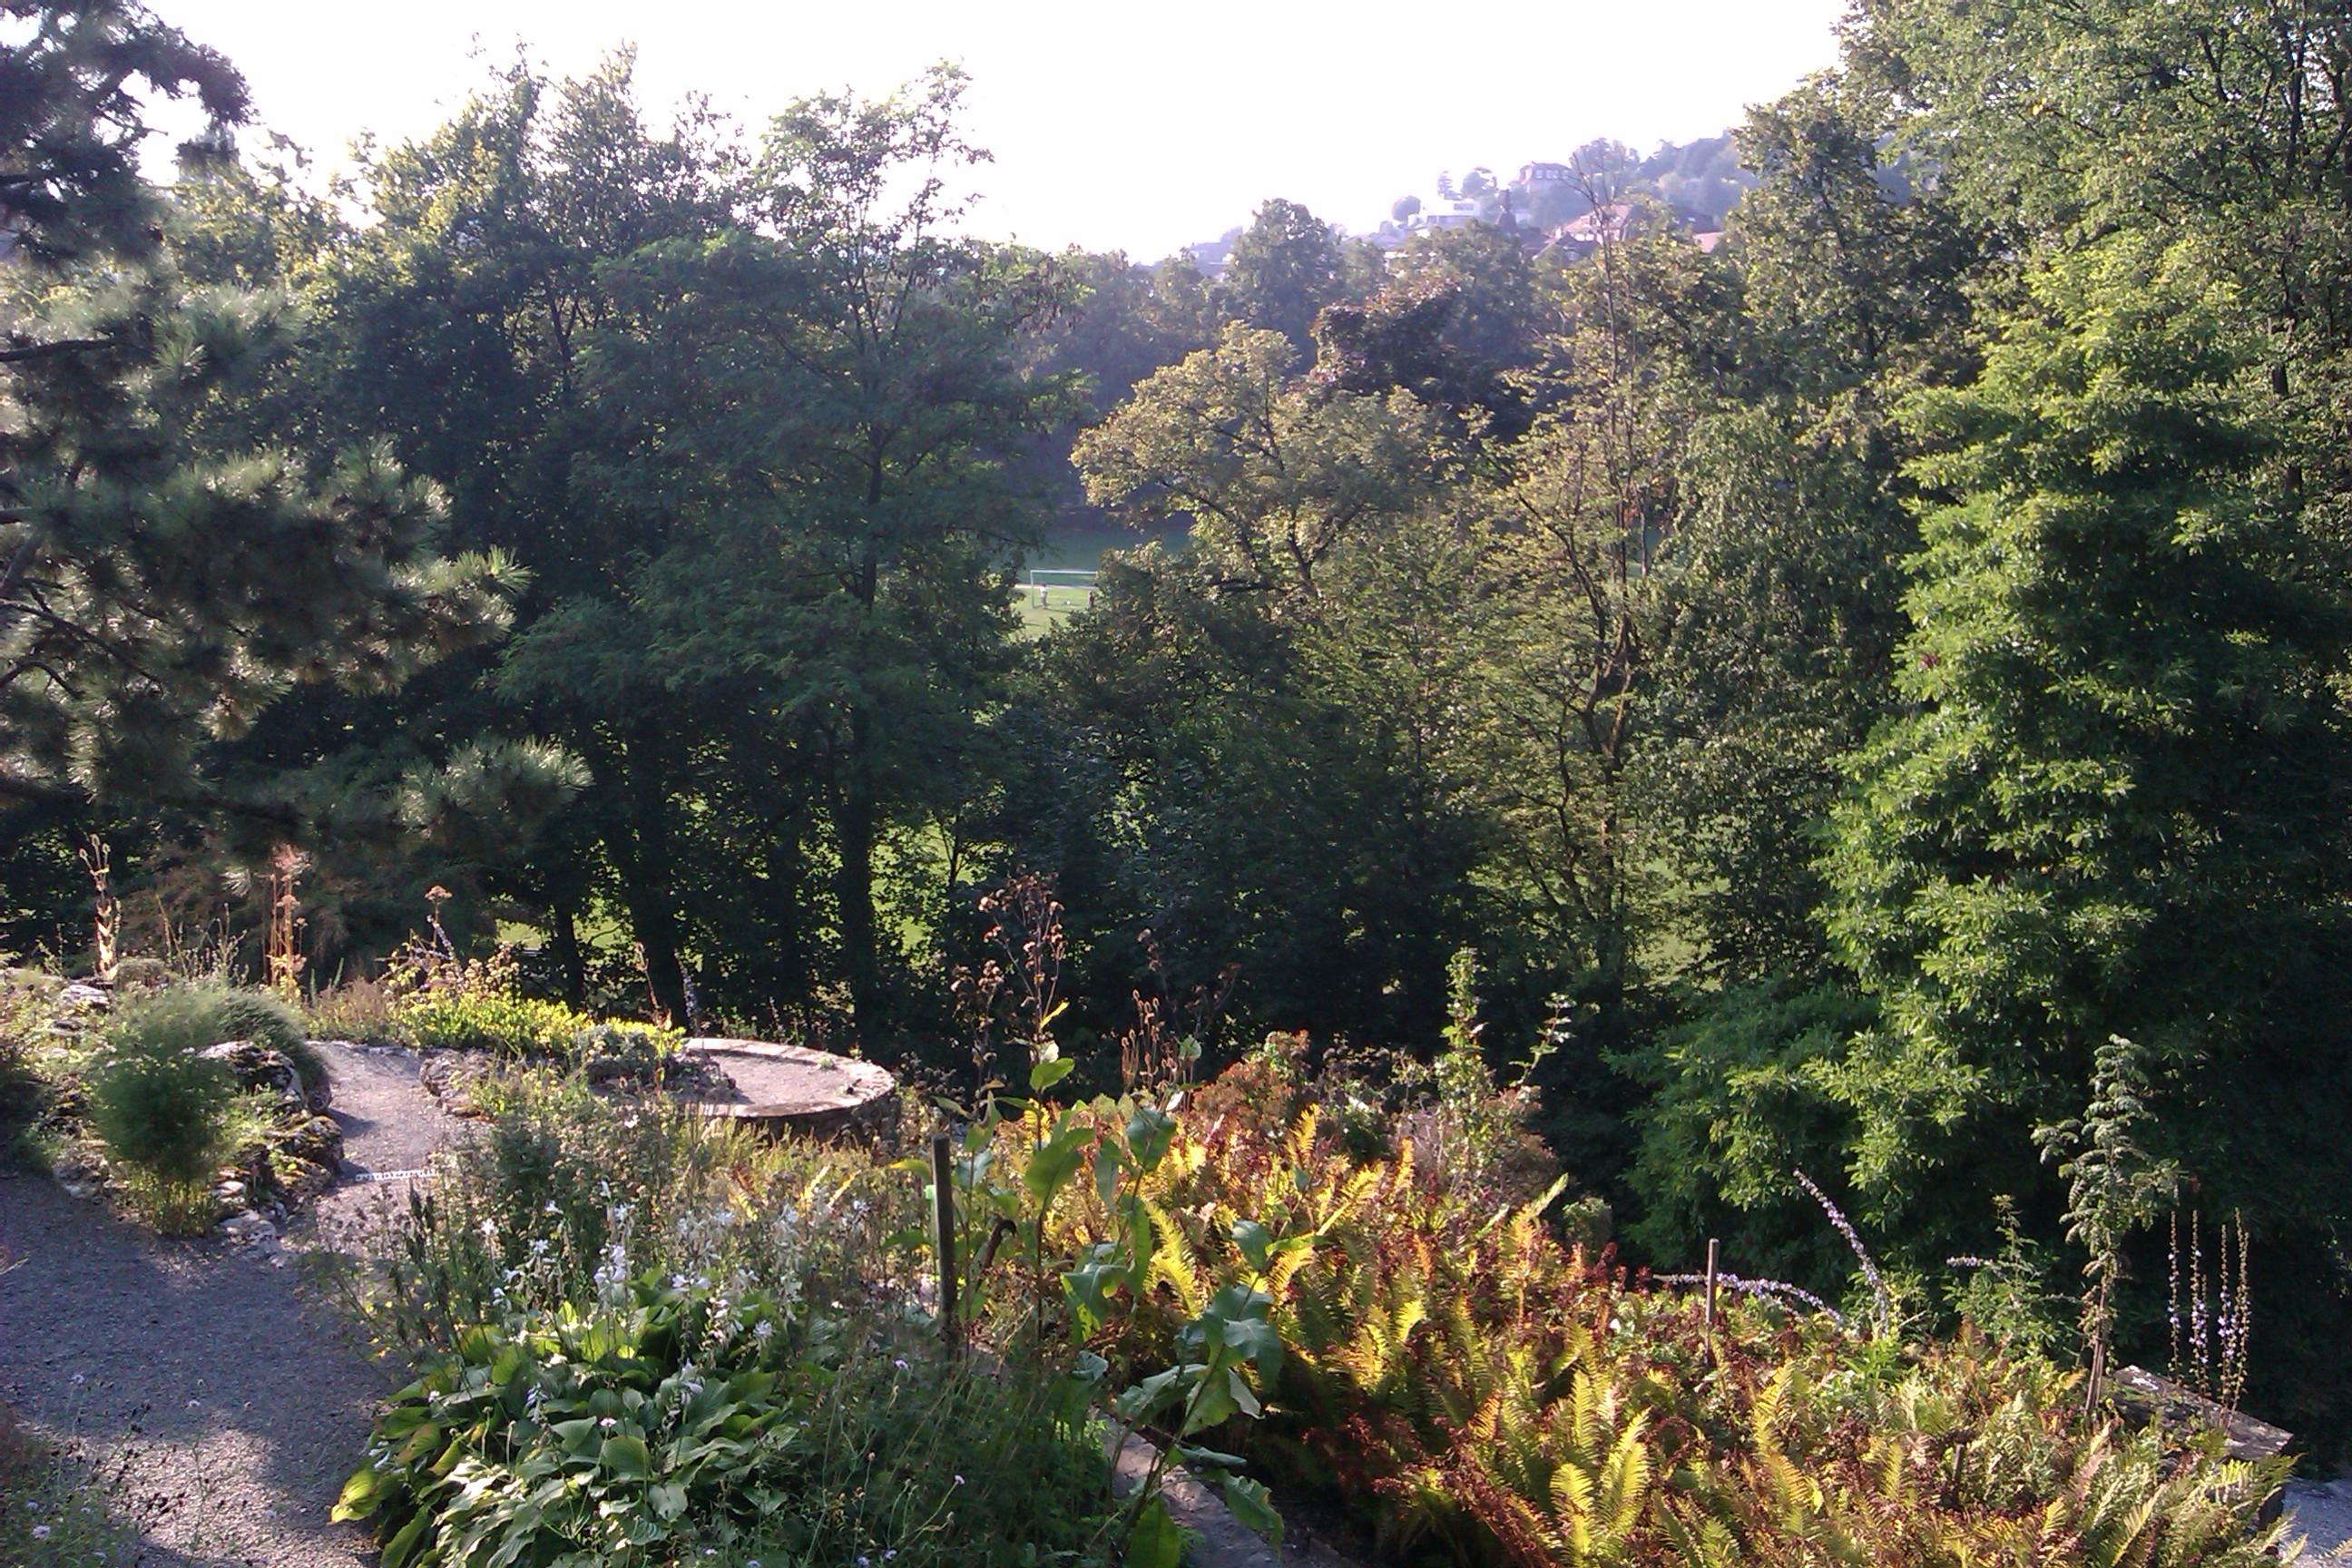 jardin botanique cantonal lausanne. Black Bedroom Furniture Sets. Home Design Ideas